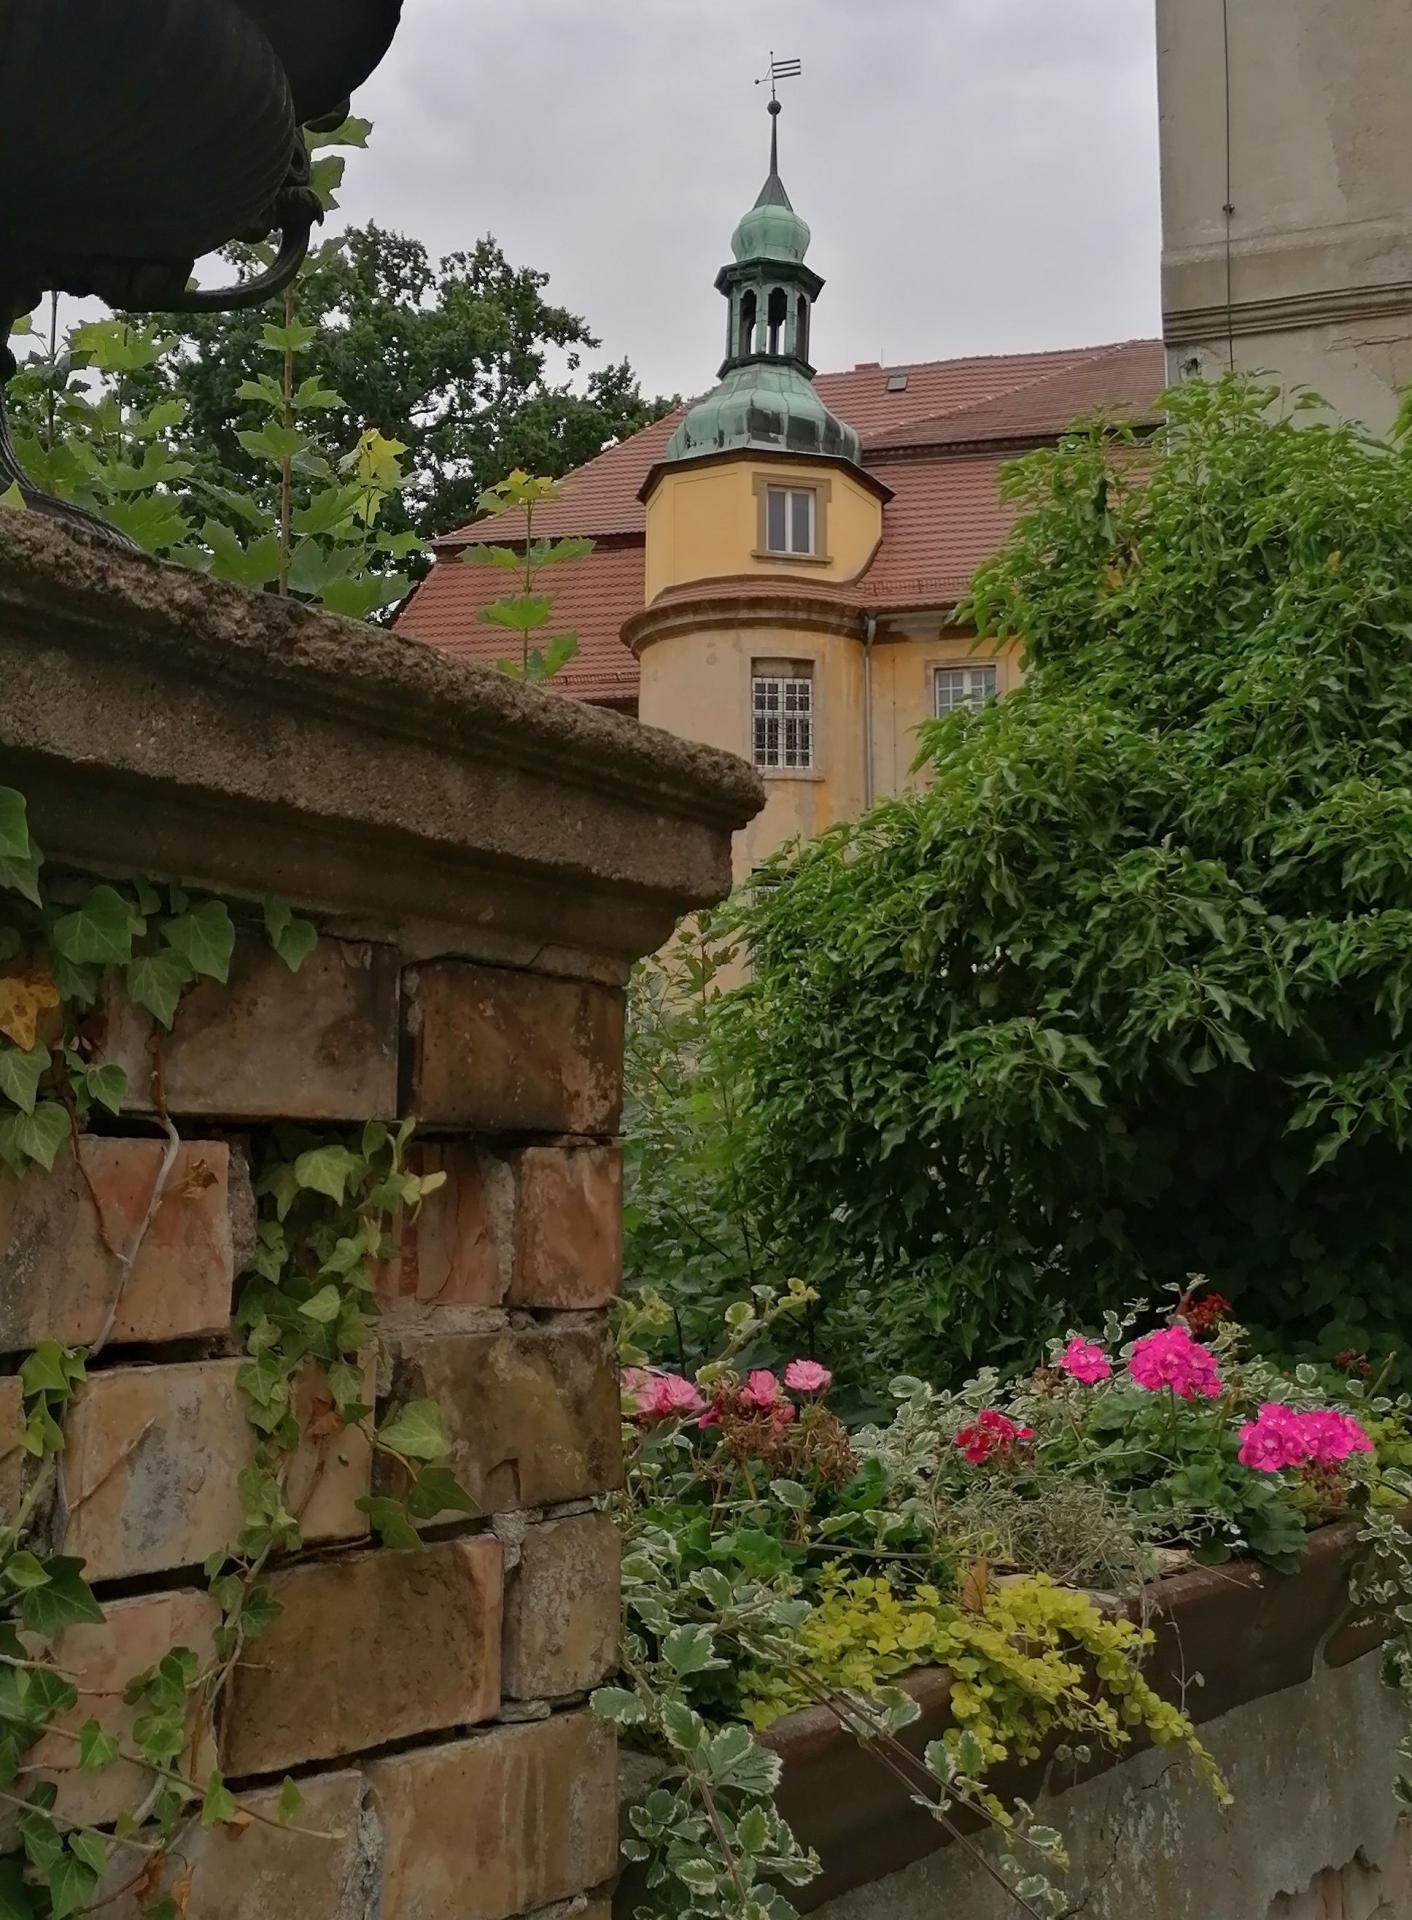 Der Landkreis Dahme-Spreewald unterstützt den Förderverein Lieberose bei dessen Bemühungen um das Schloss Lieberose. Foto: Dörthe Ziemer